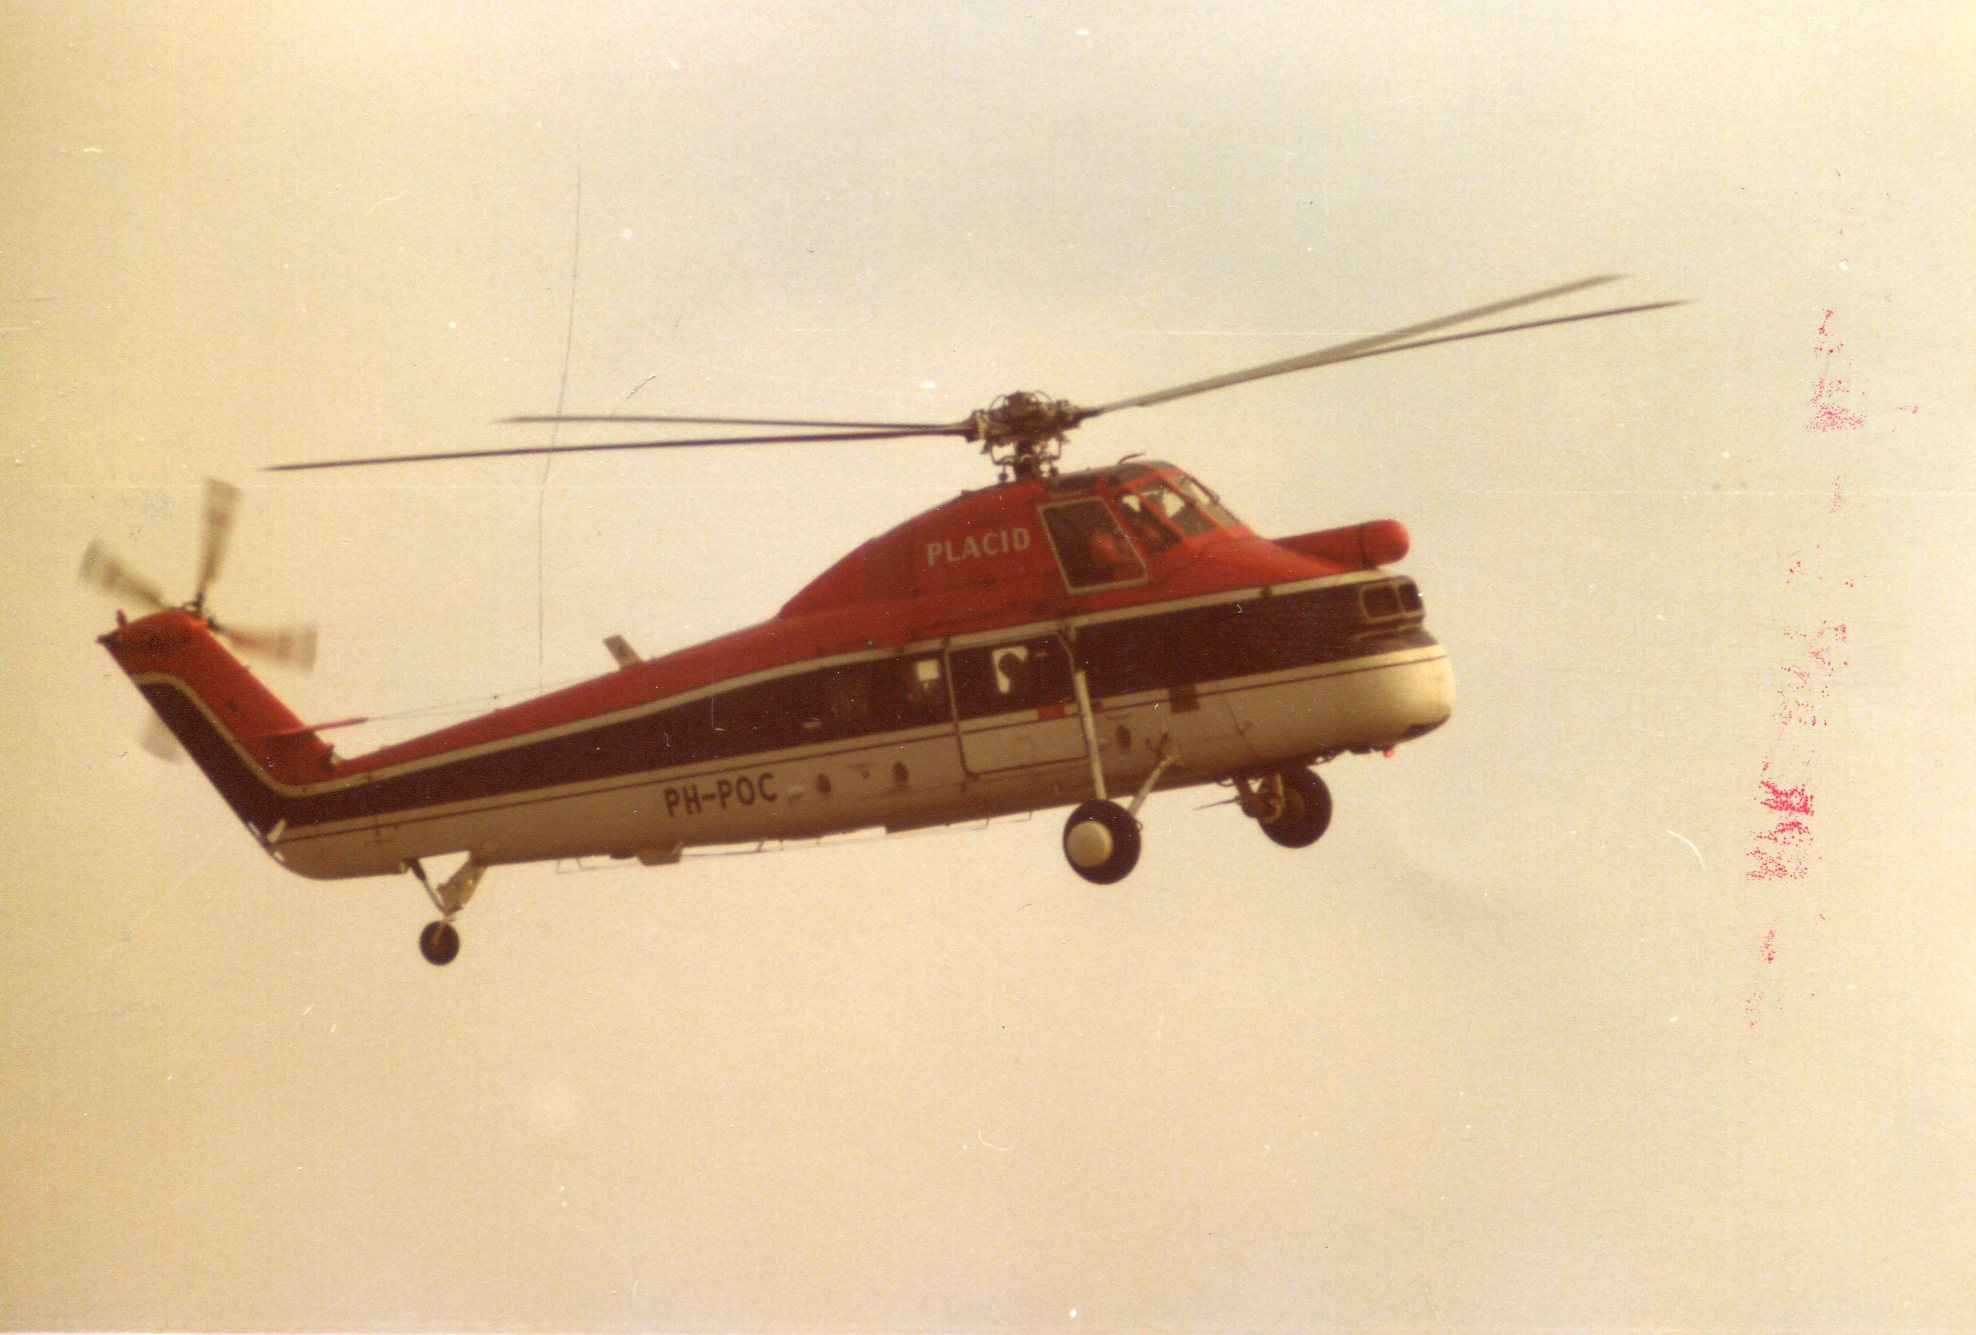 Naam: Den Helder , april 1977 (3).jpg Bekeken: 397 Grootte: 334,4 KB